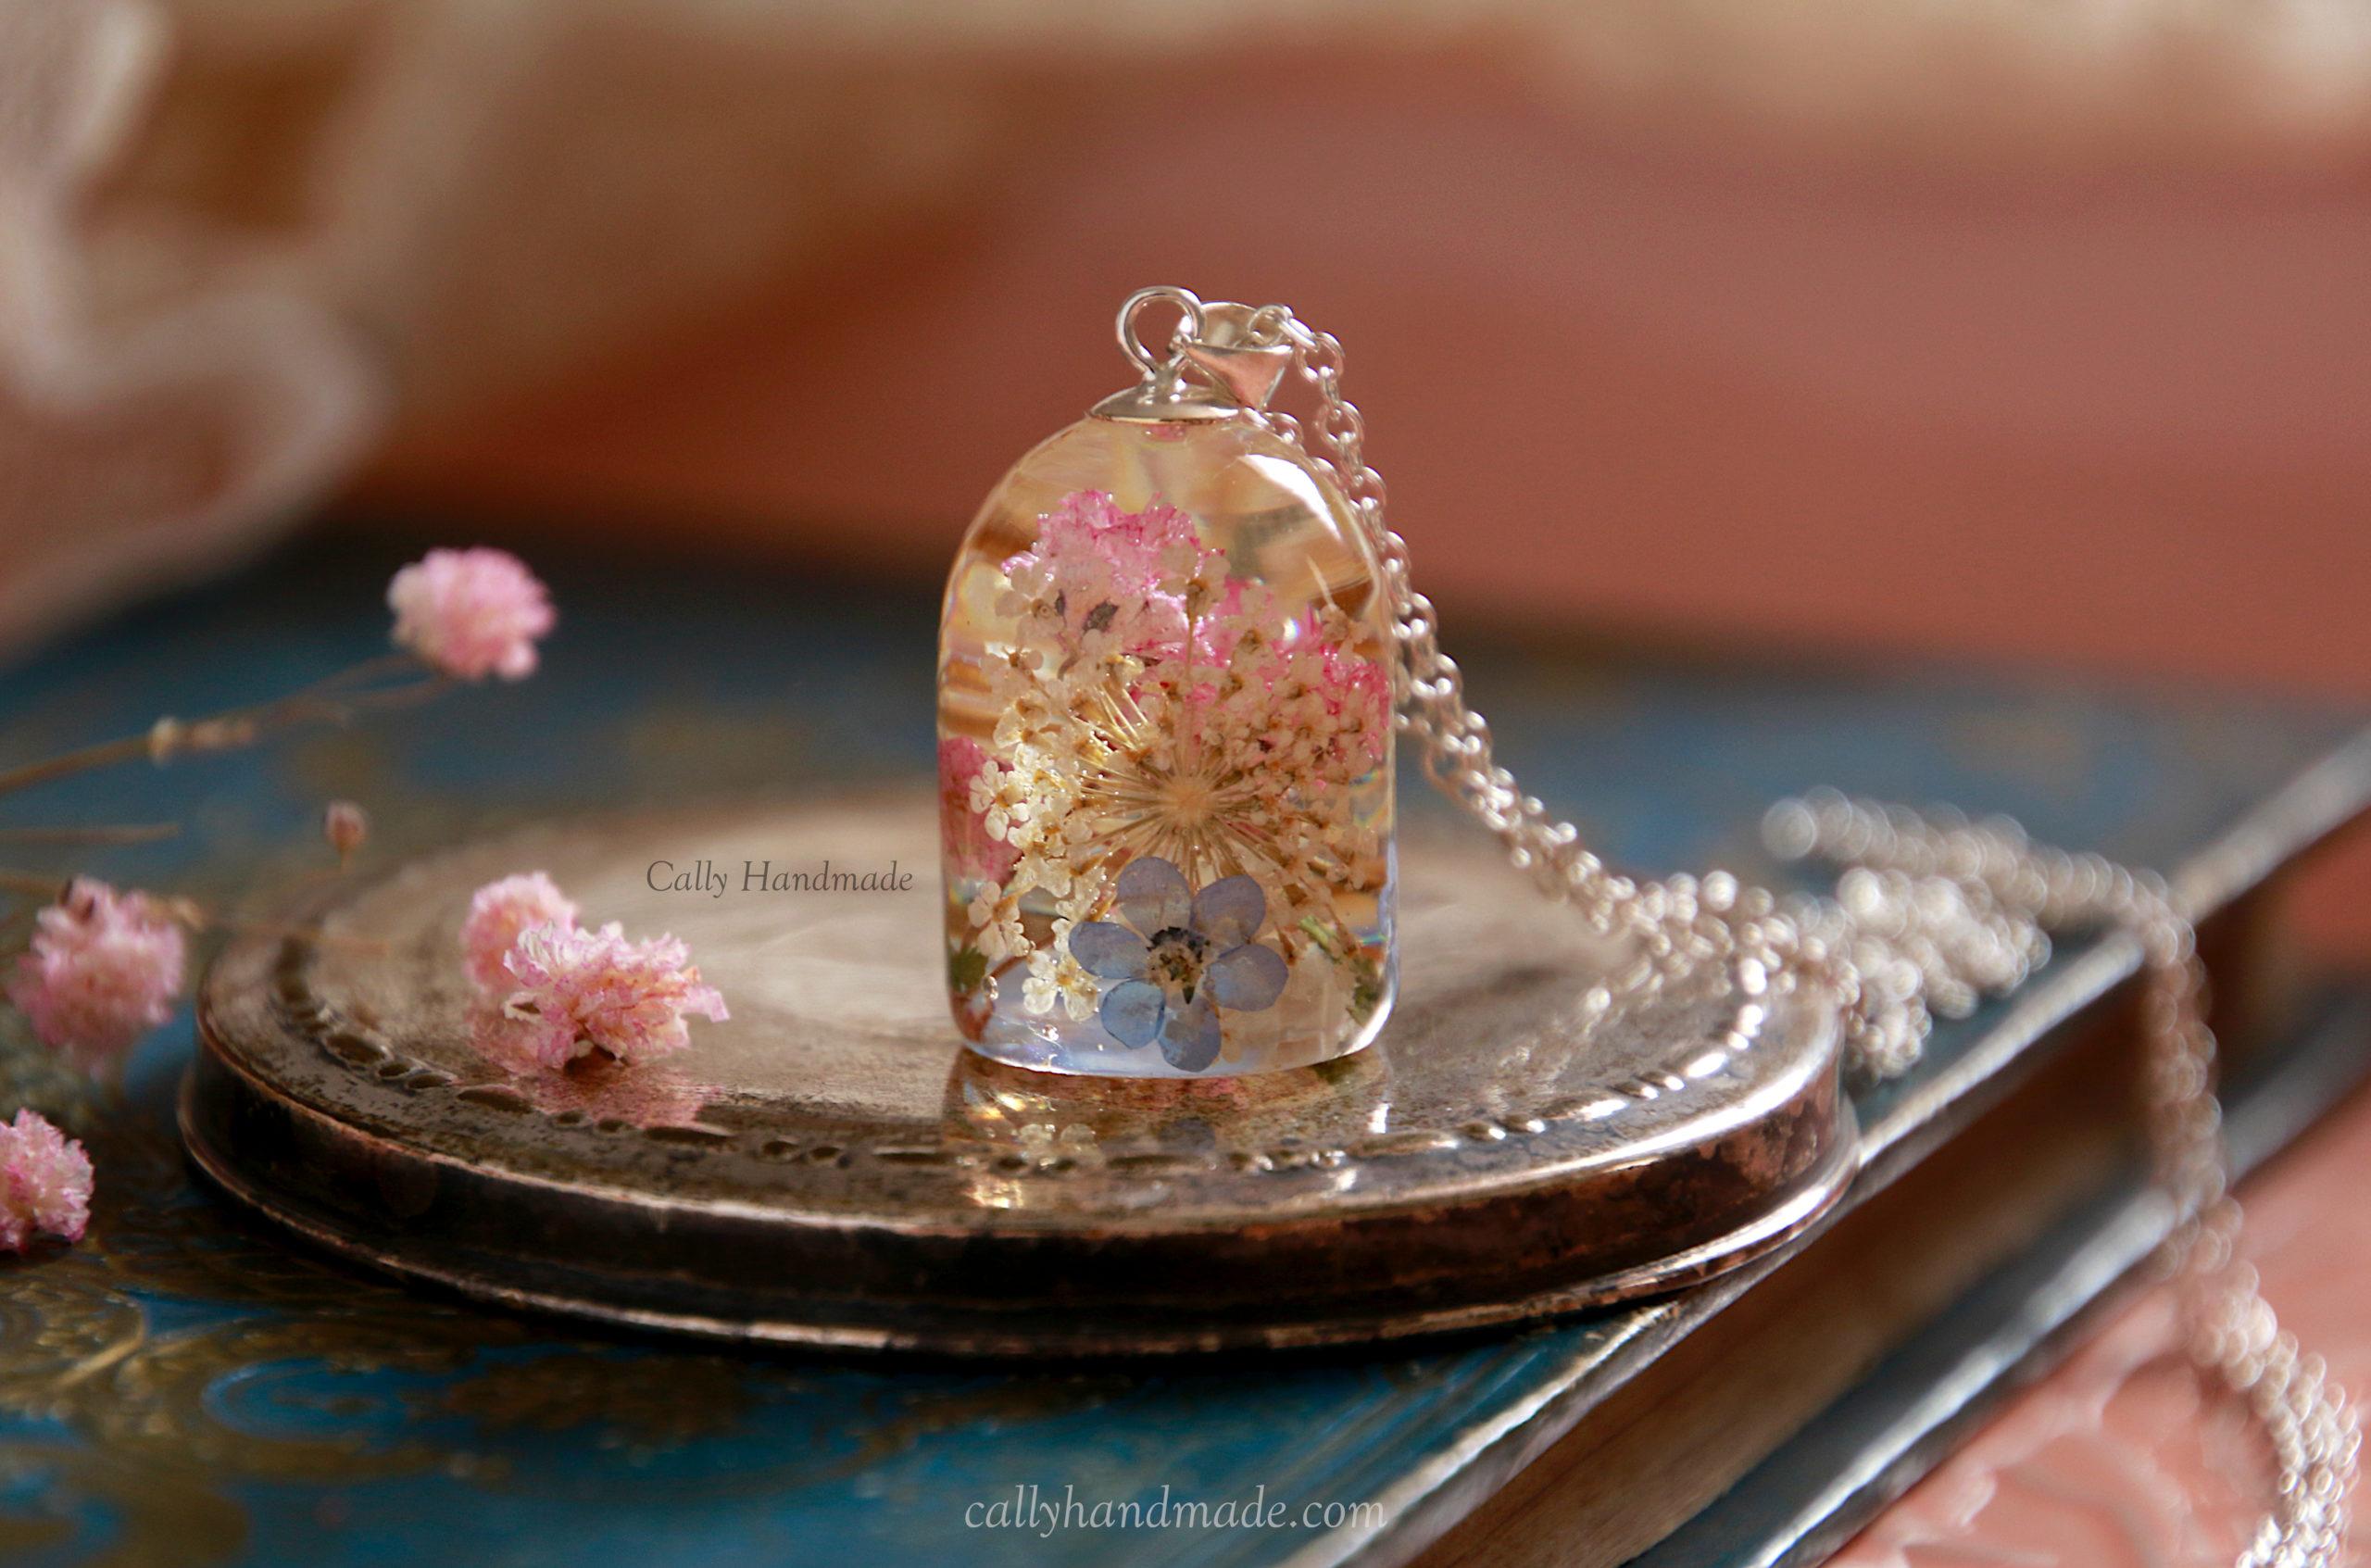 bijou fleurs cally handmade argent 925